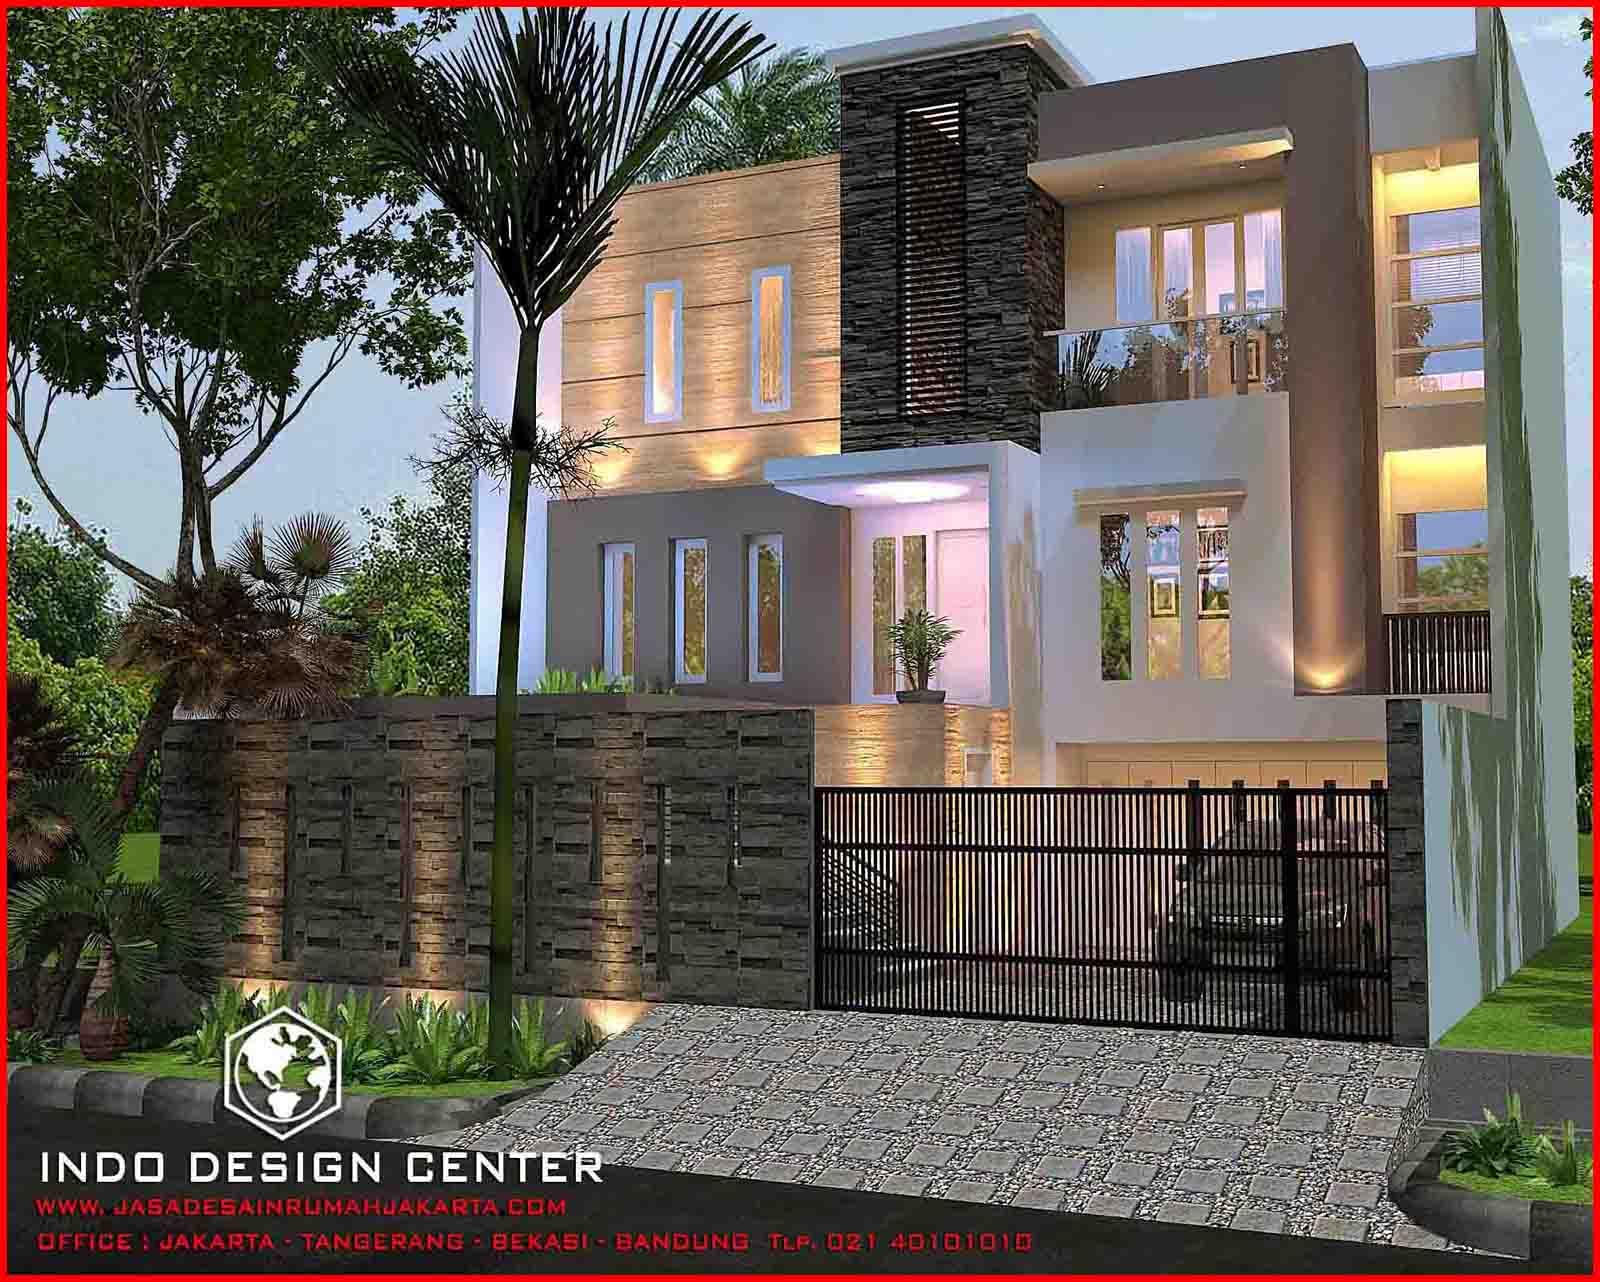 Gambar Rumah Minimalis 3 Lantai Pak Indra Jasa Desain Rumah Jakarta